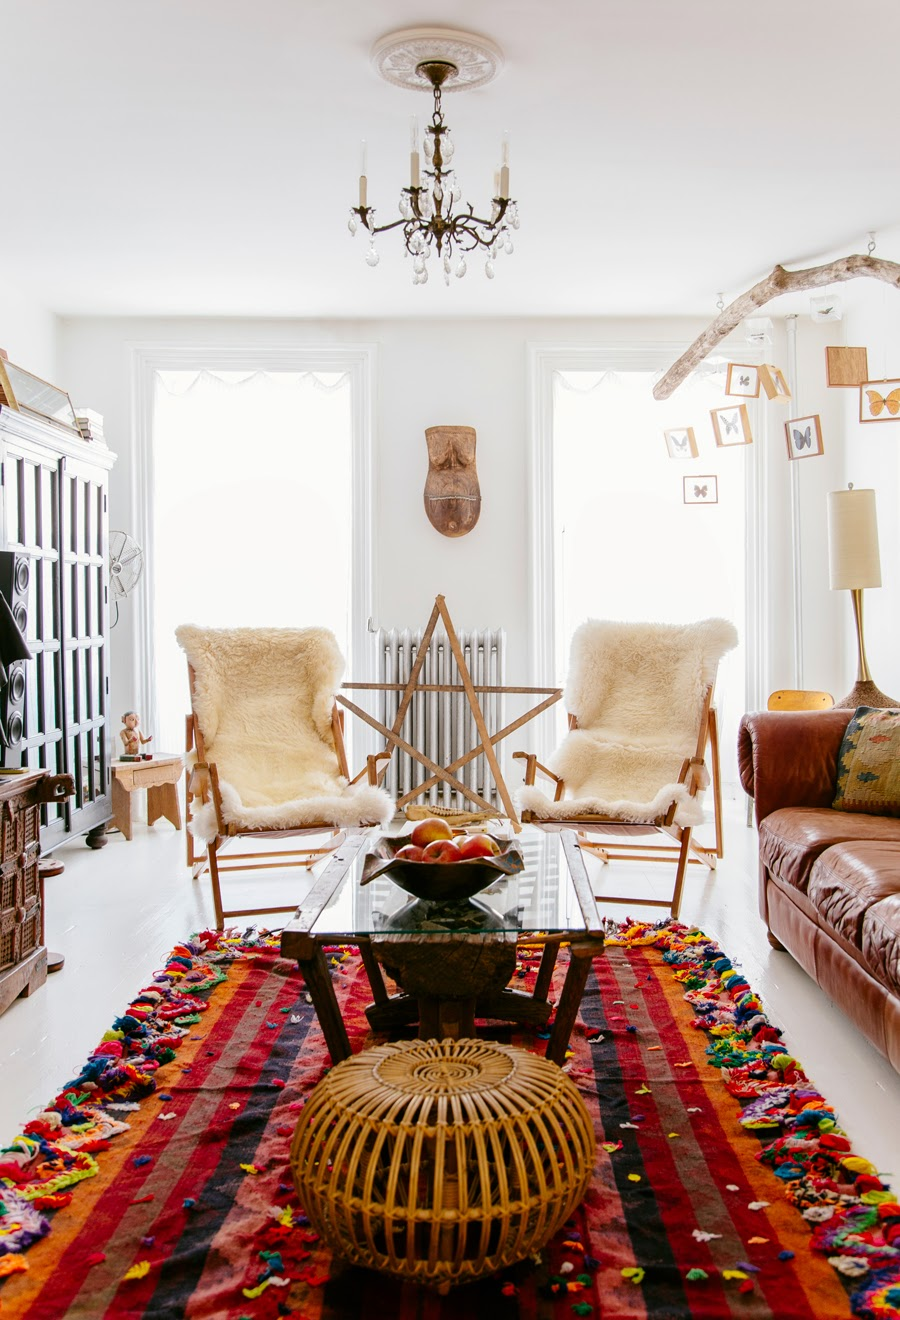 Inspiration bohemian interiors seaofgirasoles - Design your living room ...